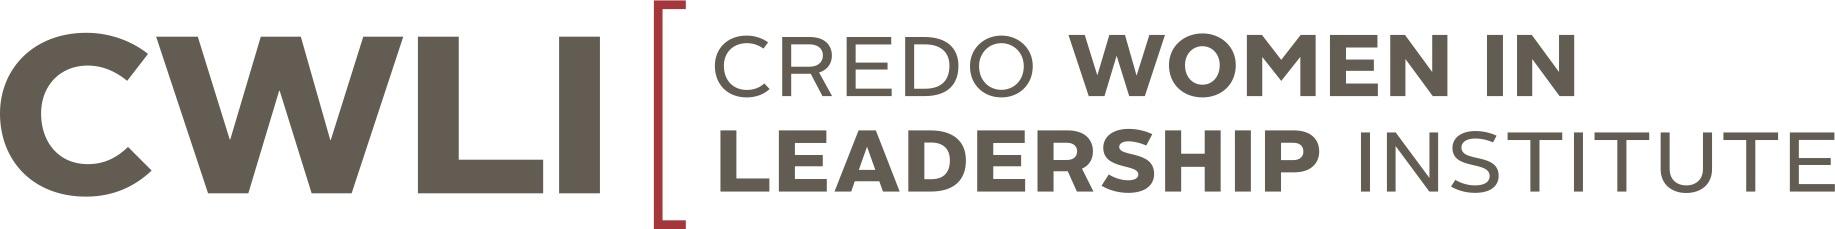 Credo Women in Leadership Institute Header Image